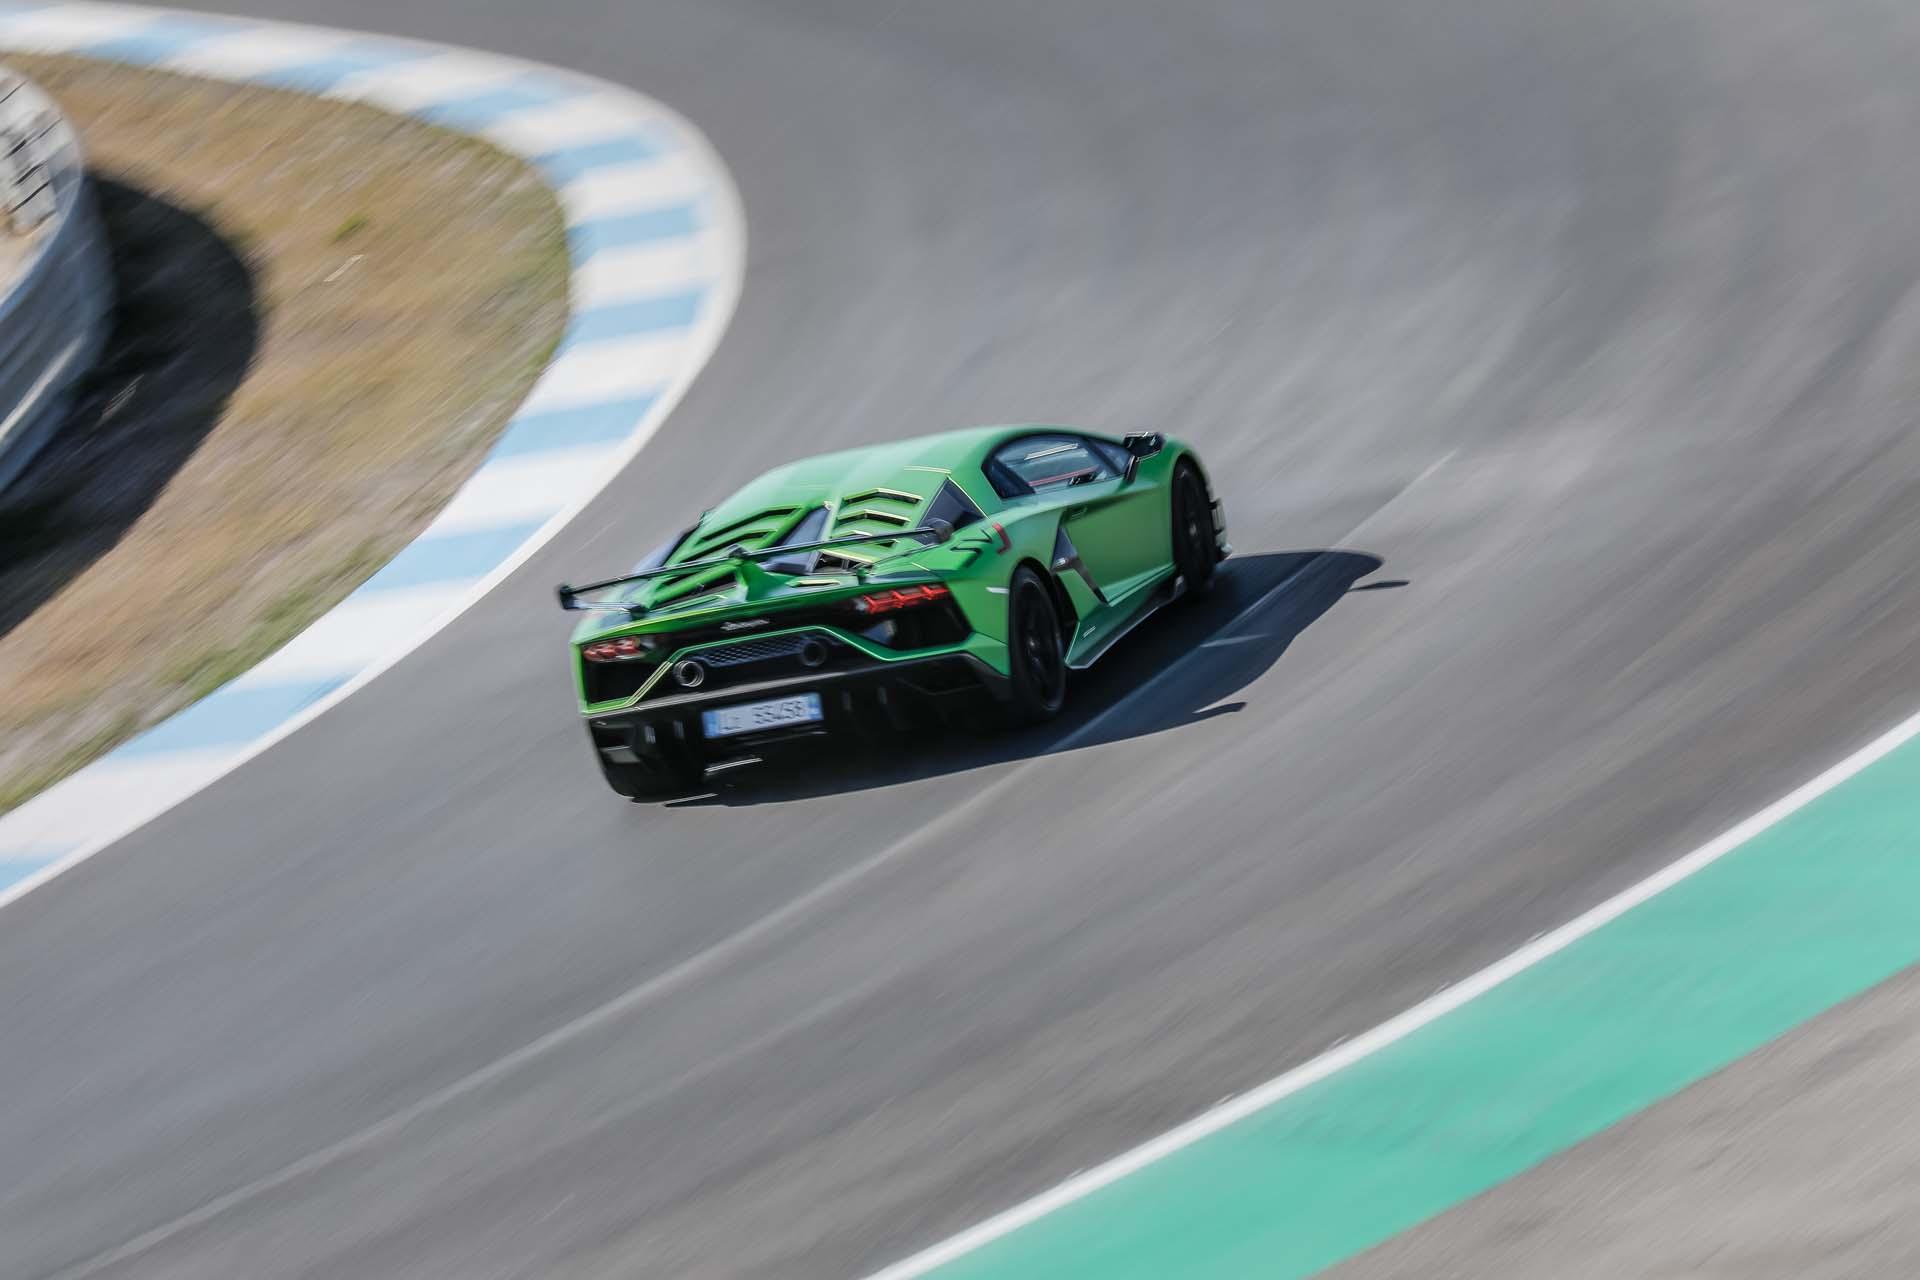 2019 Lamborghini Aventador SVJ Rear Wallpapers #41 of 241